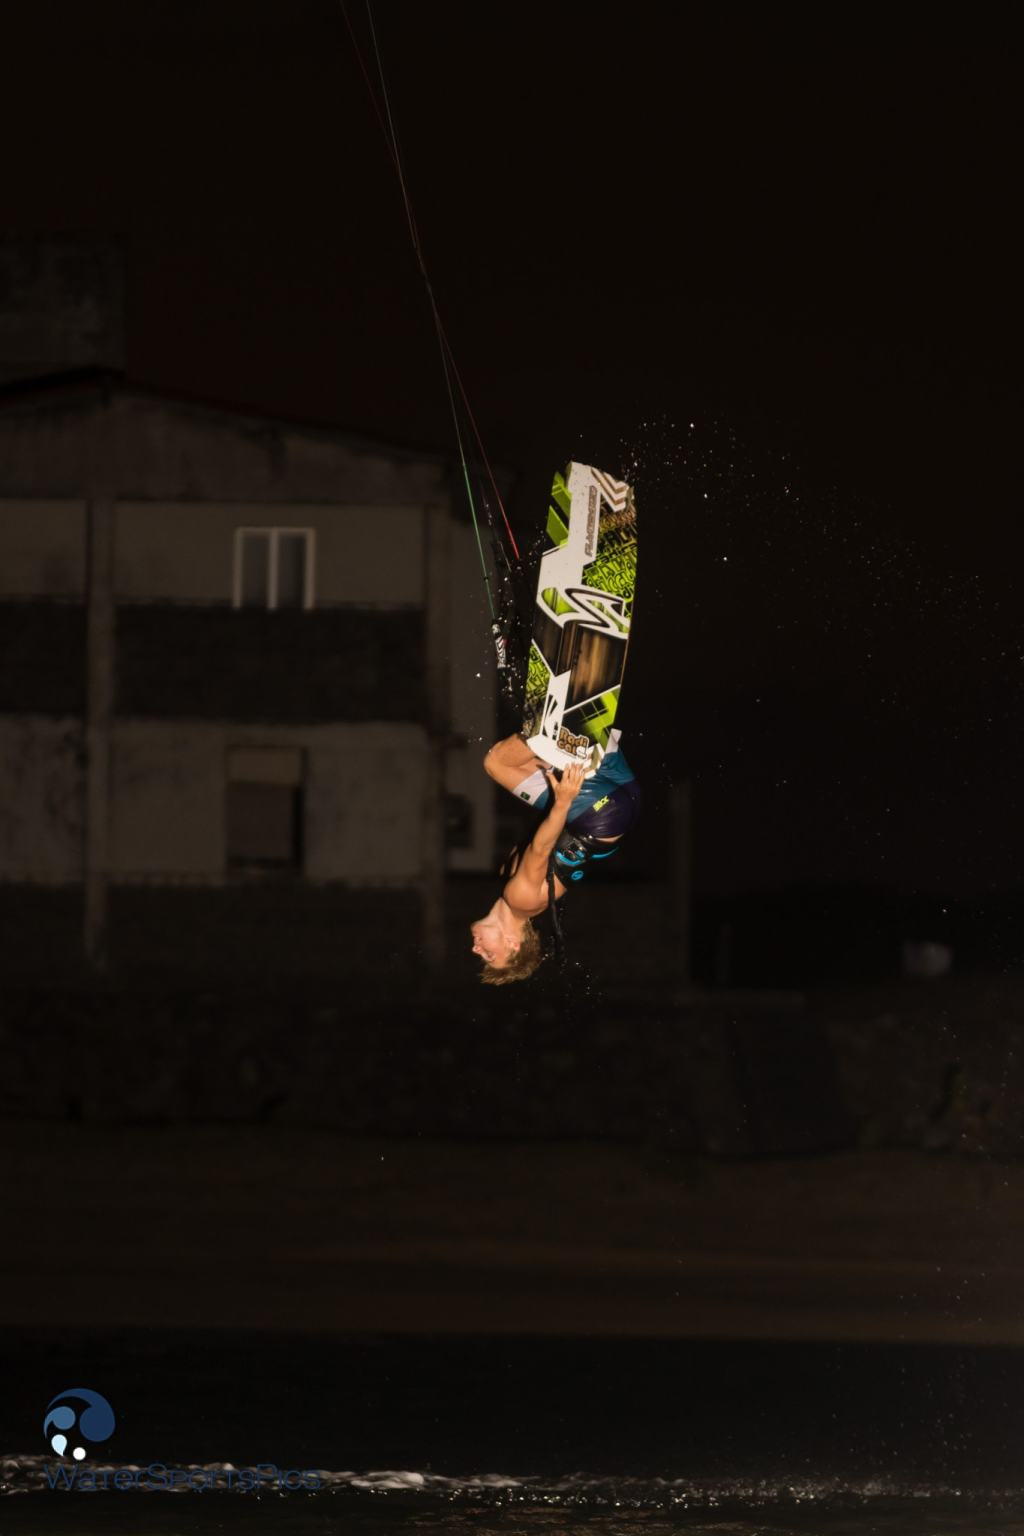 Evening flash session with Dylan van der Meij (Flysurfer/Jobe/Lip/Lifely/Versus) on the lagoon of Barra do Rio, Brazil on 11 November 2014